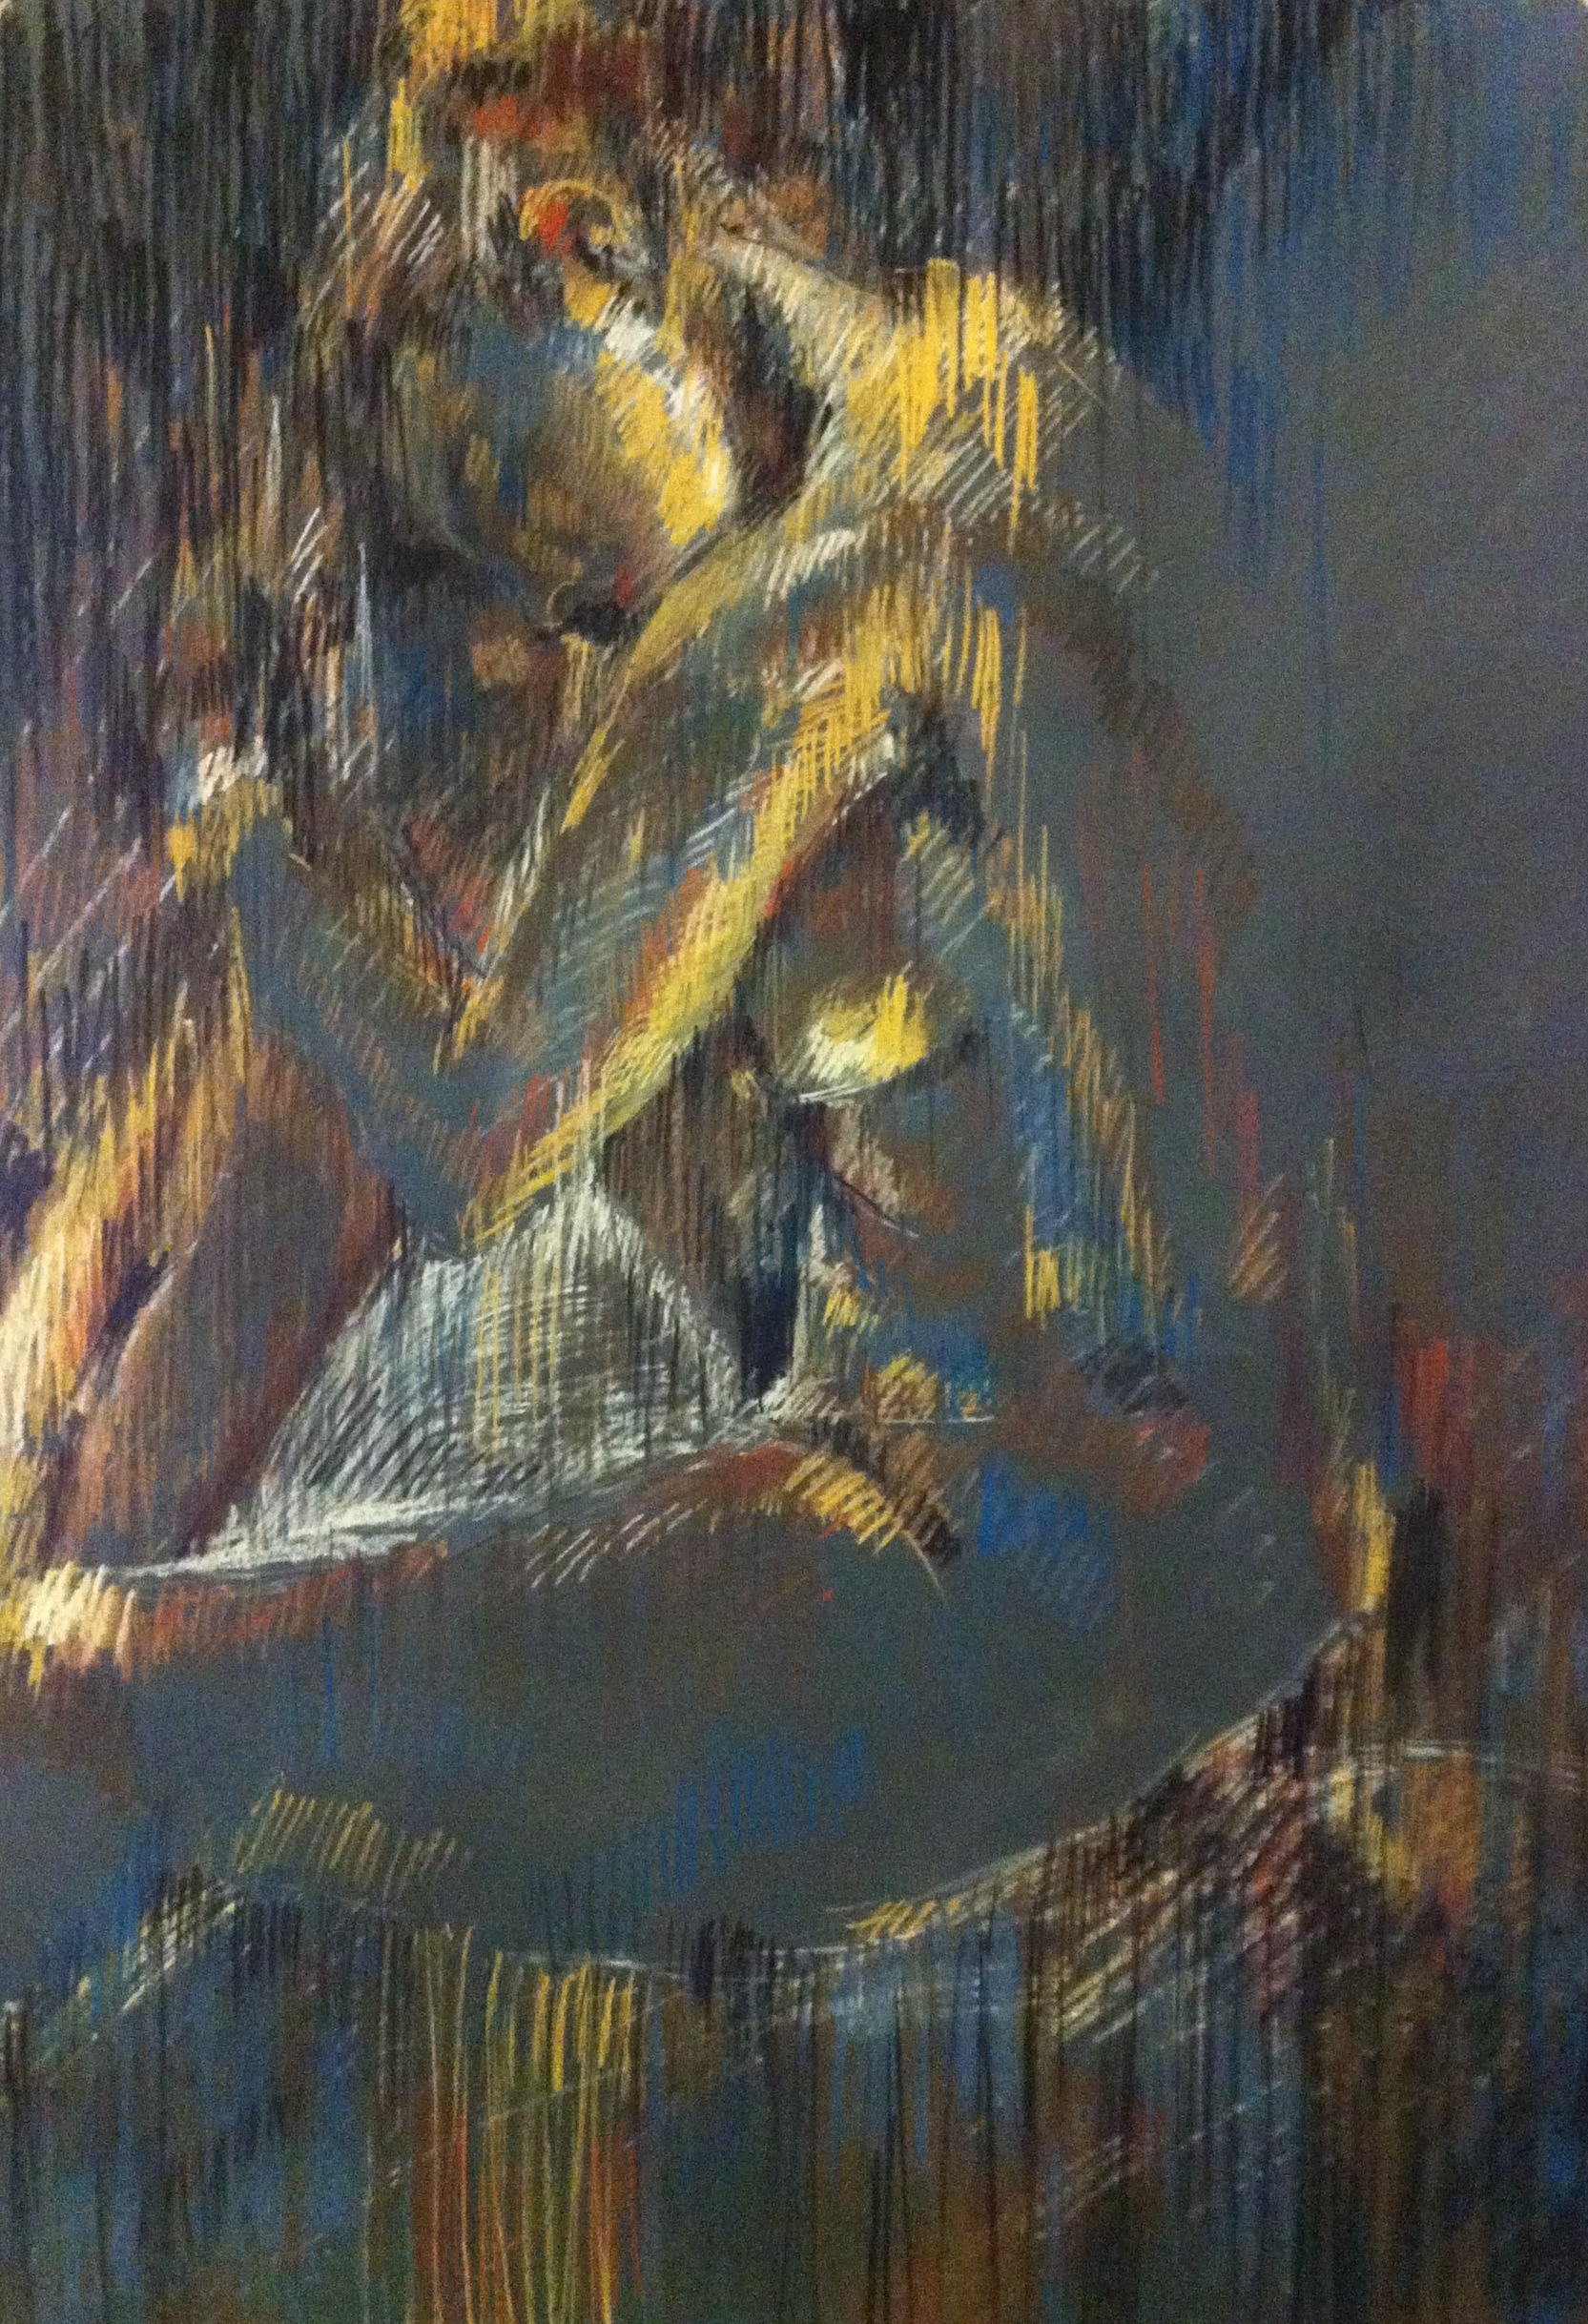 The rain (to Federico Garcia Lorca)